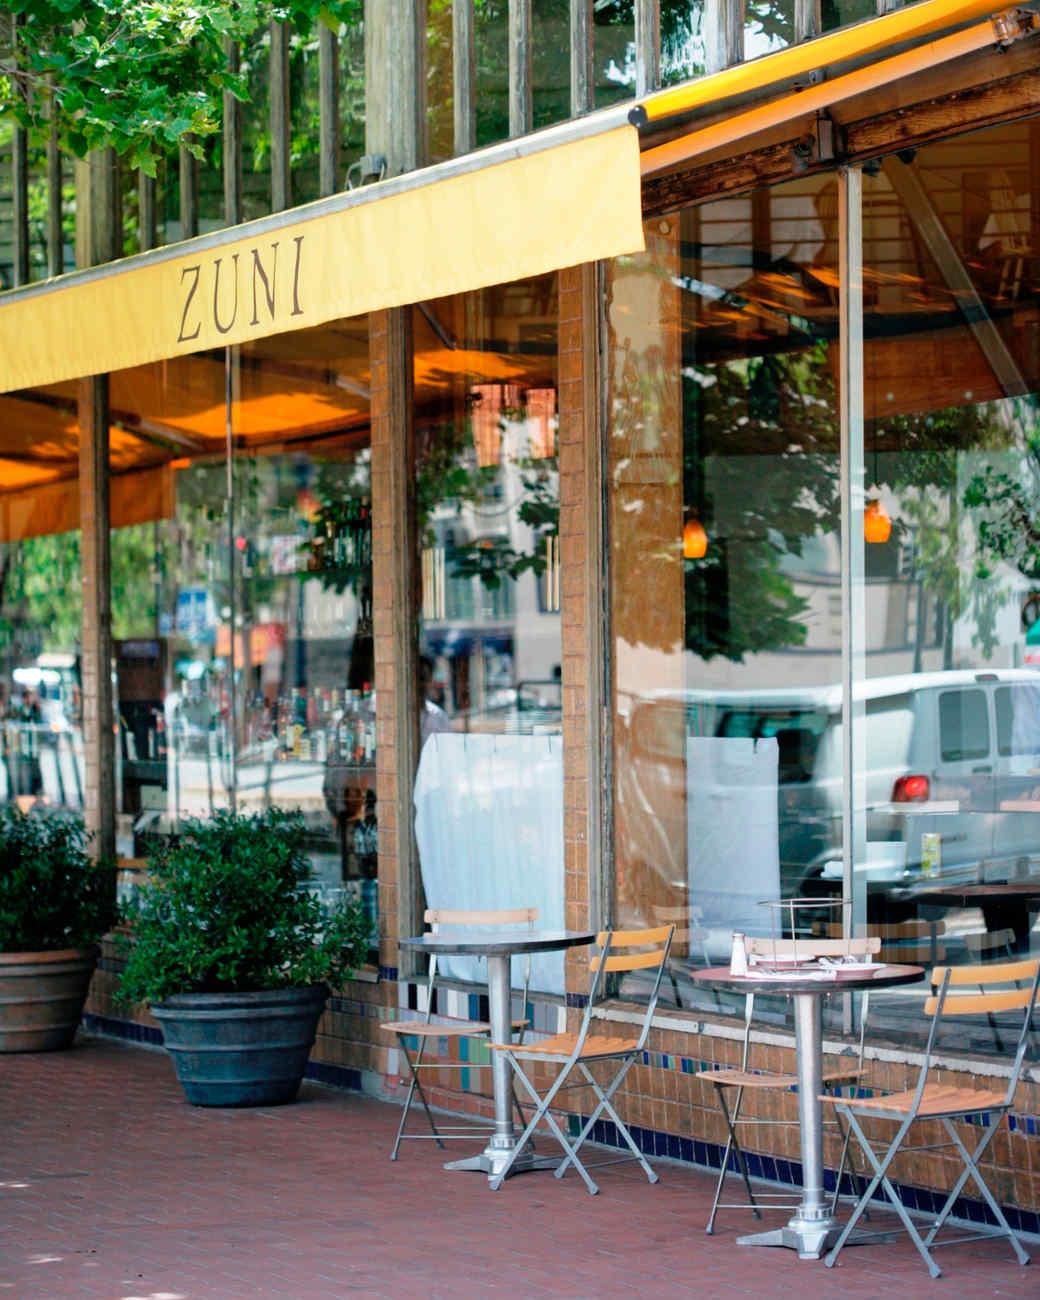 zuni-cafe.jpg